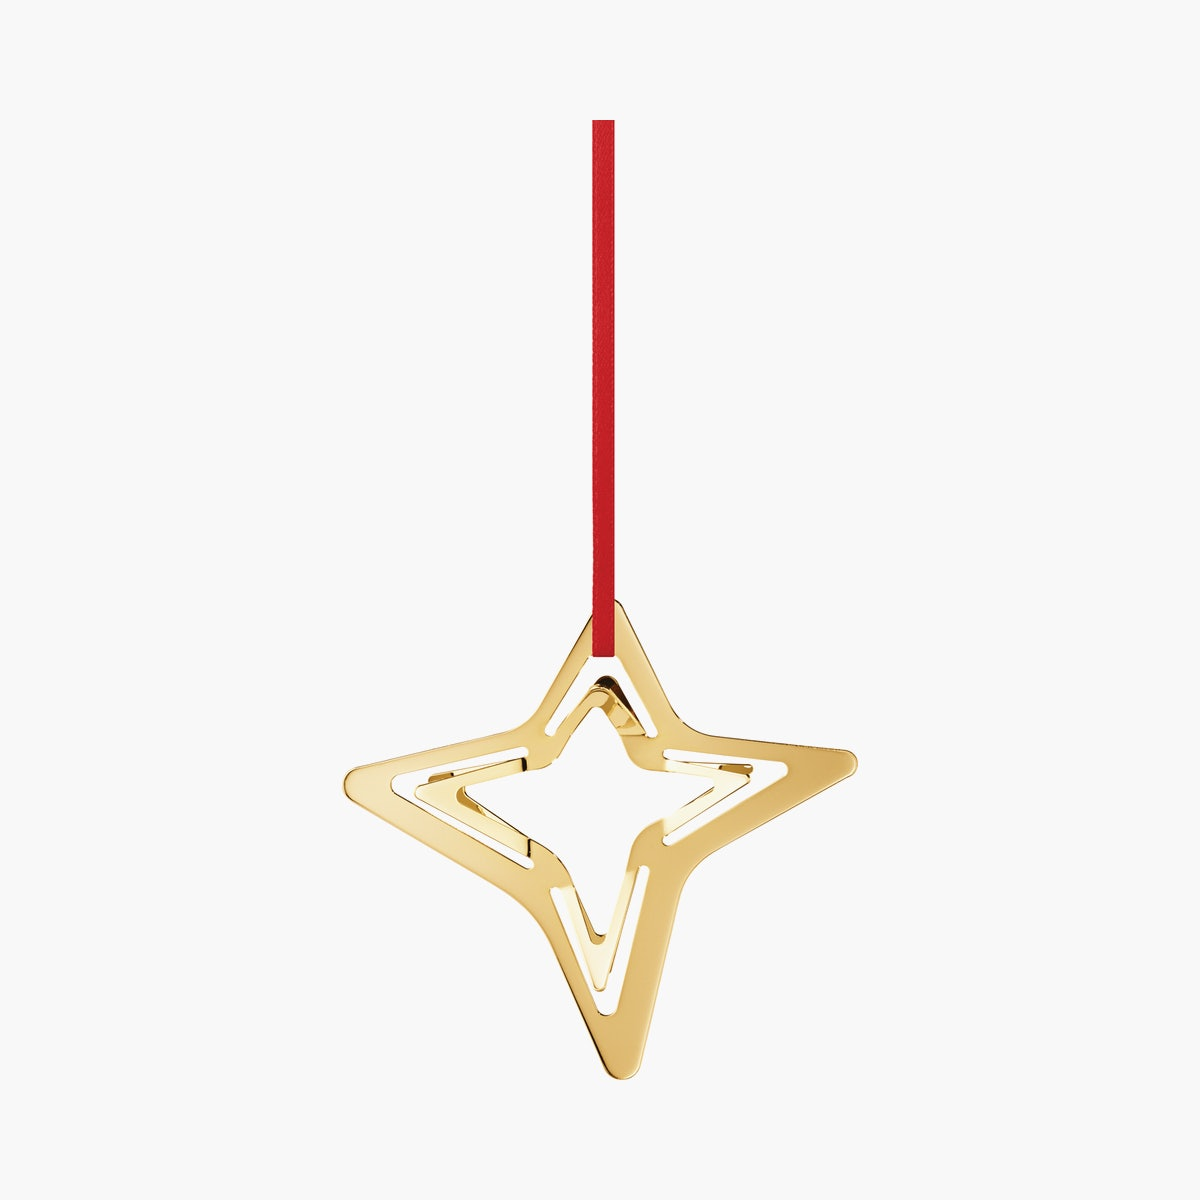 Georg Jensen Star Ornaments, 4 Point